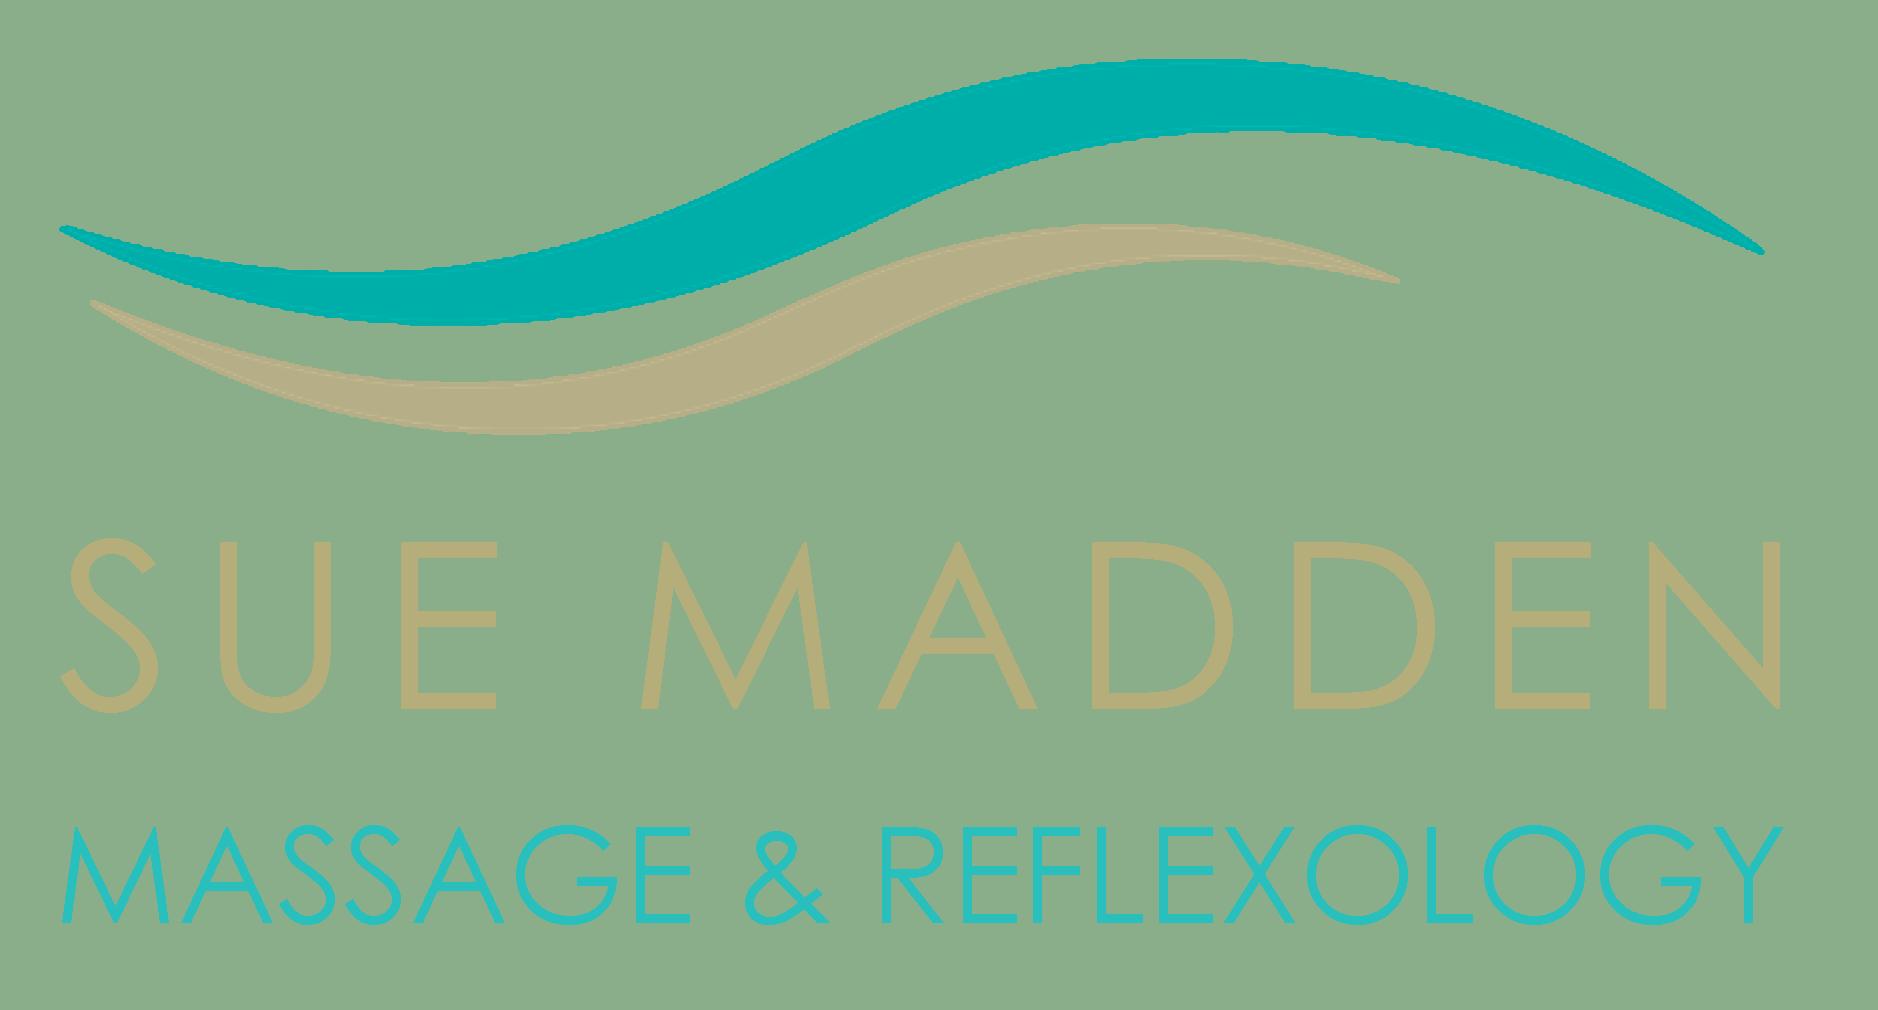 Sue Madden Massage Therapy